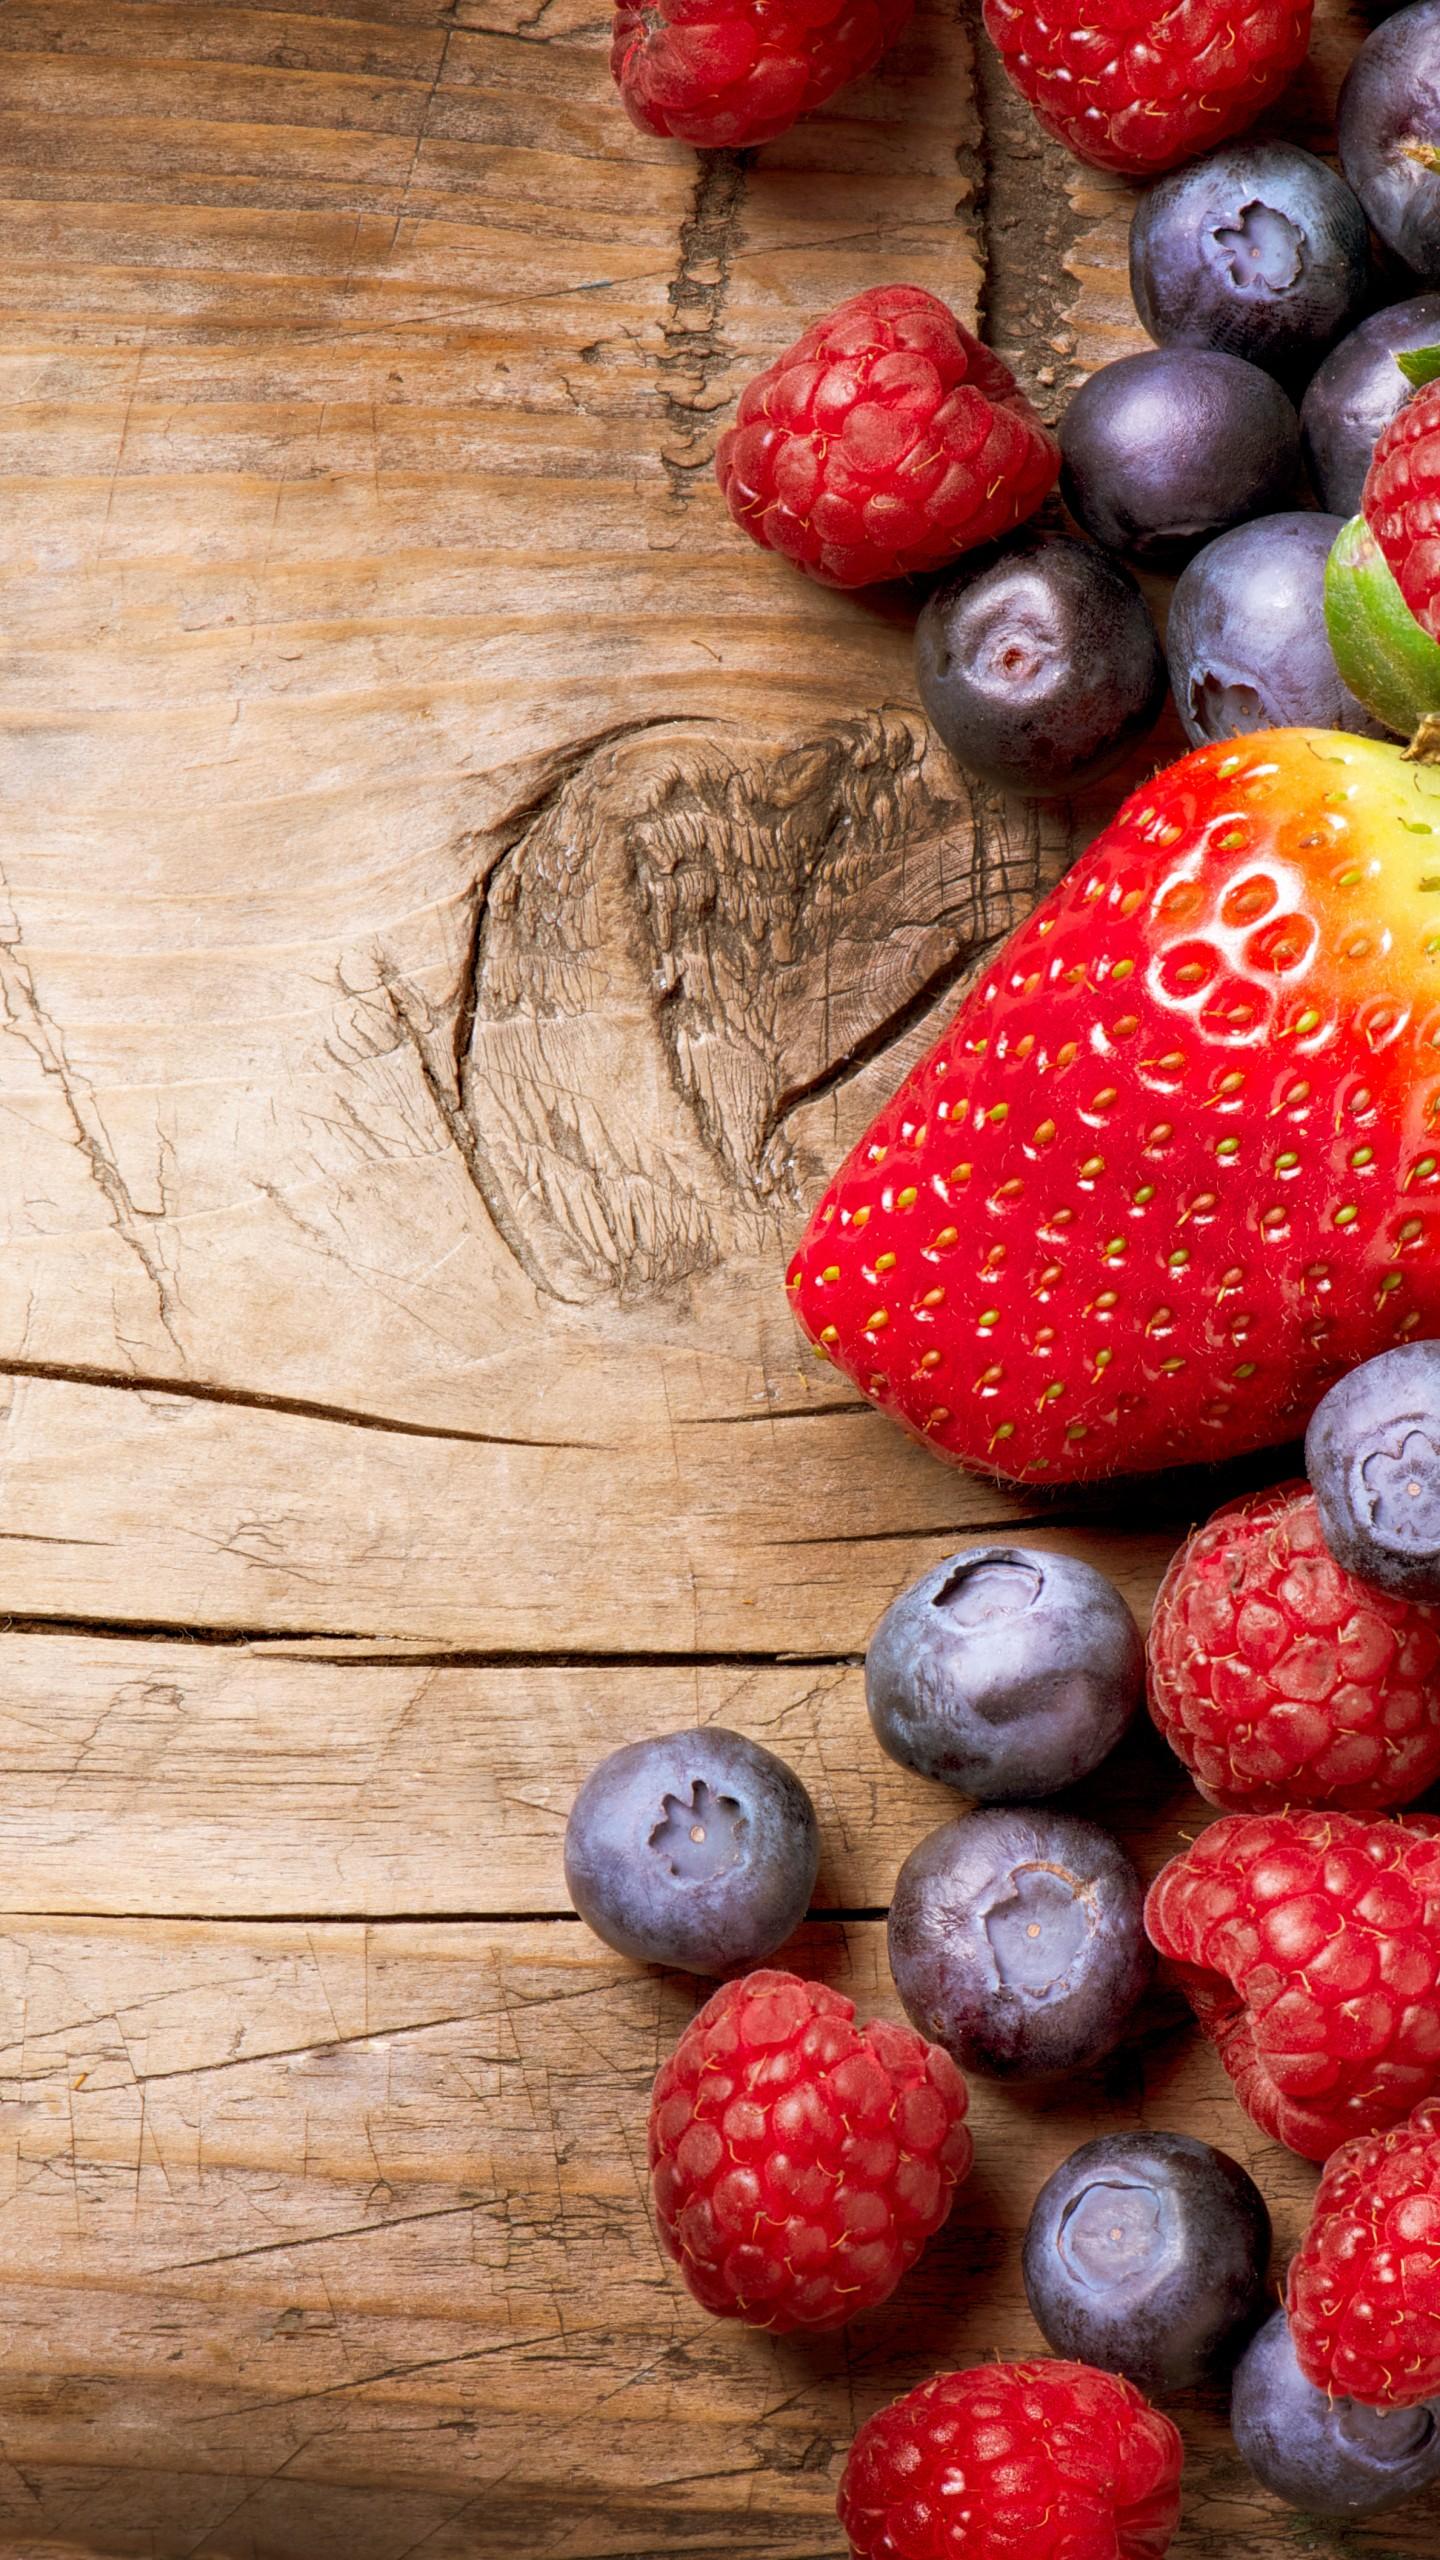 Wallpaper Berries Fruits Strawberry Raspberry